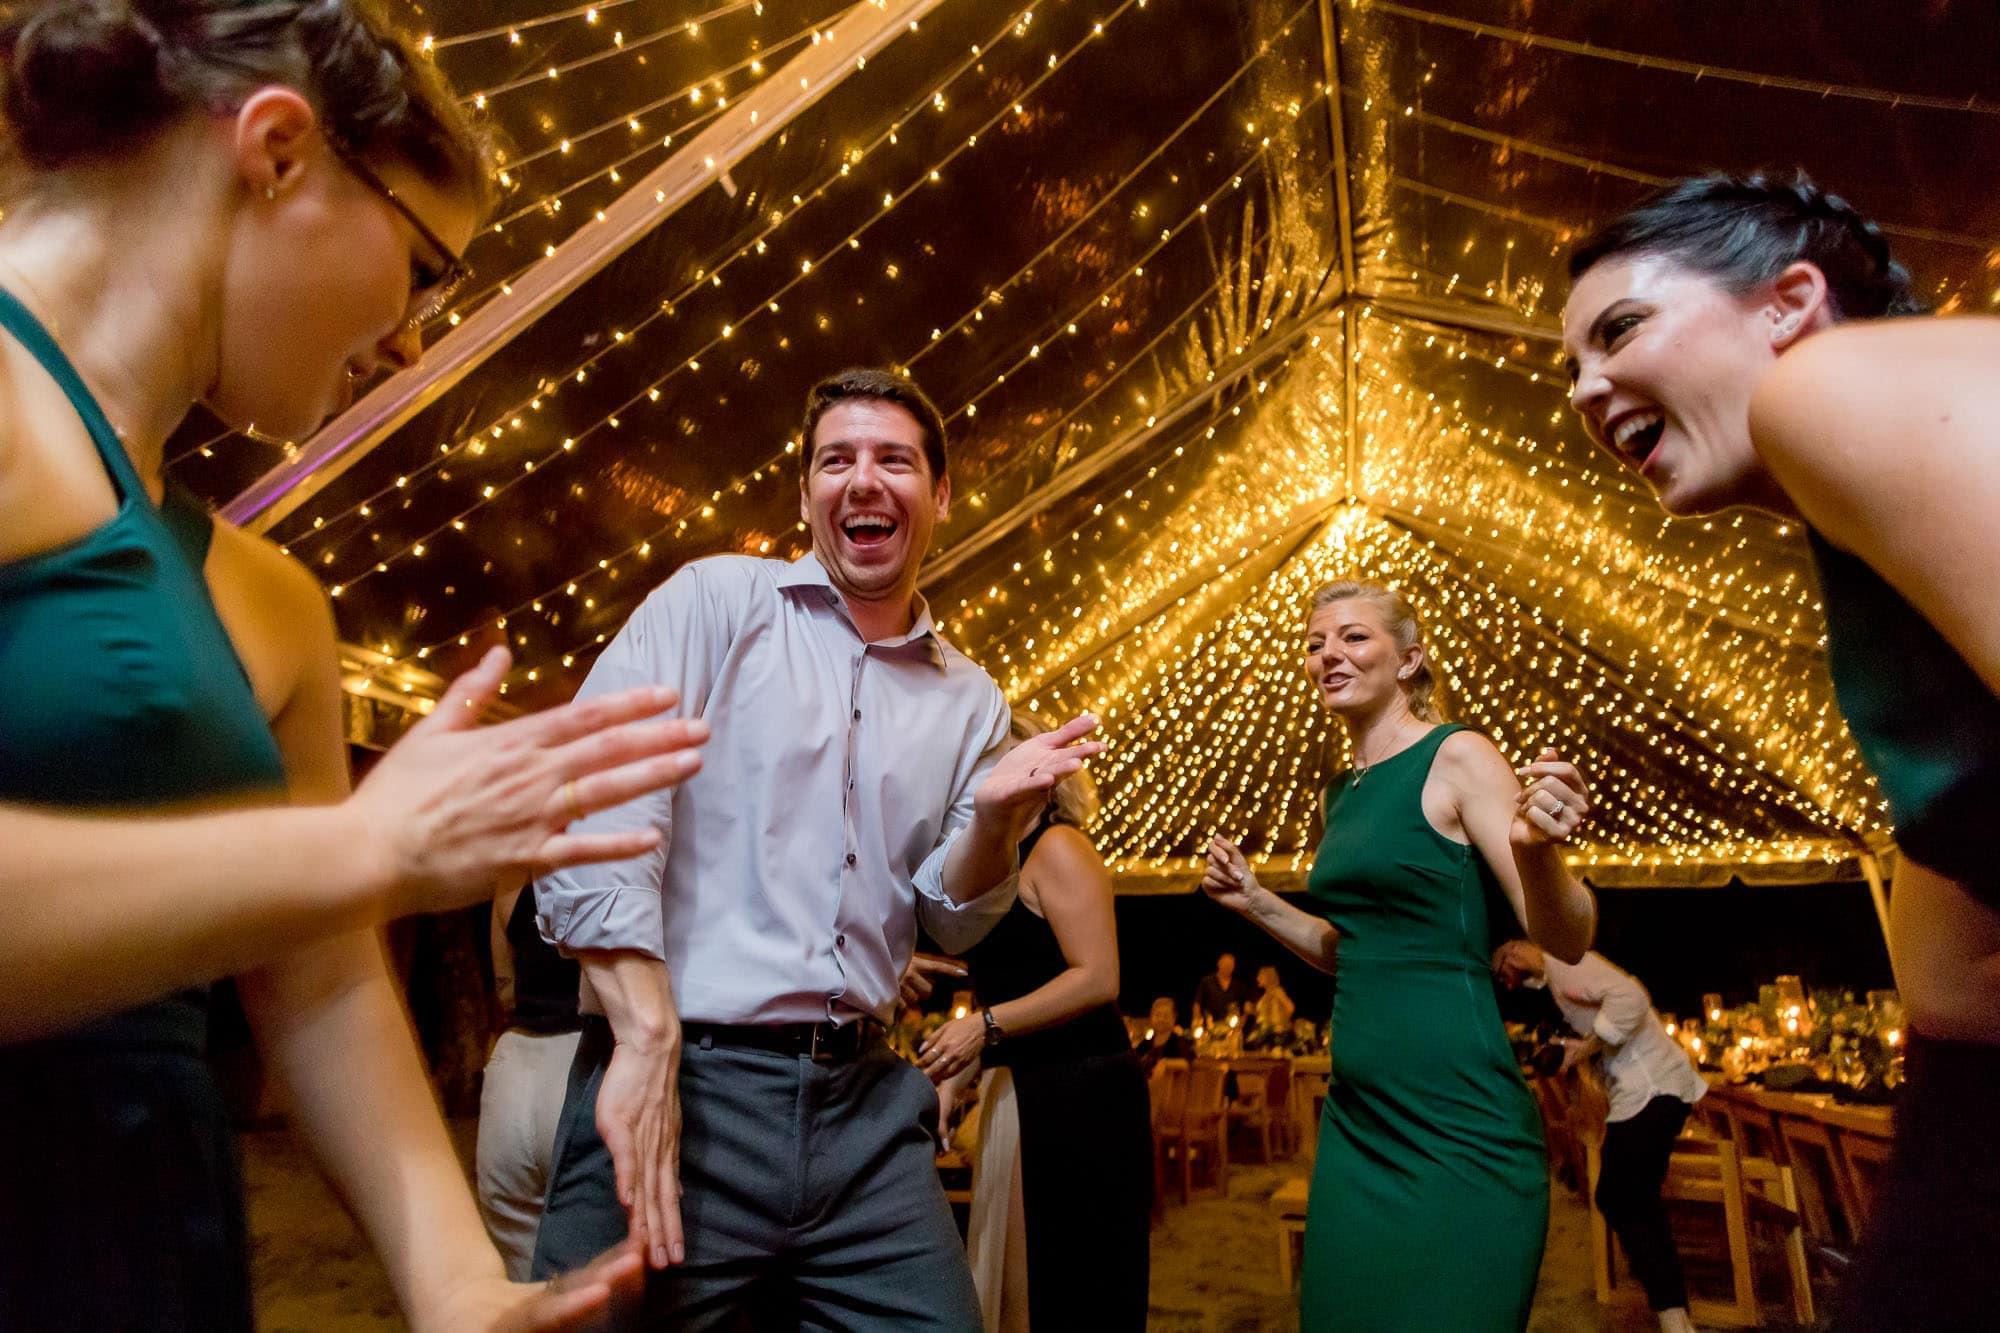 Dancing at the beach wedding reception